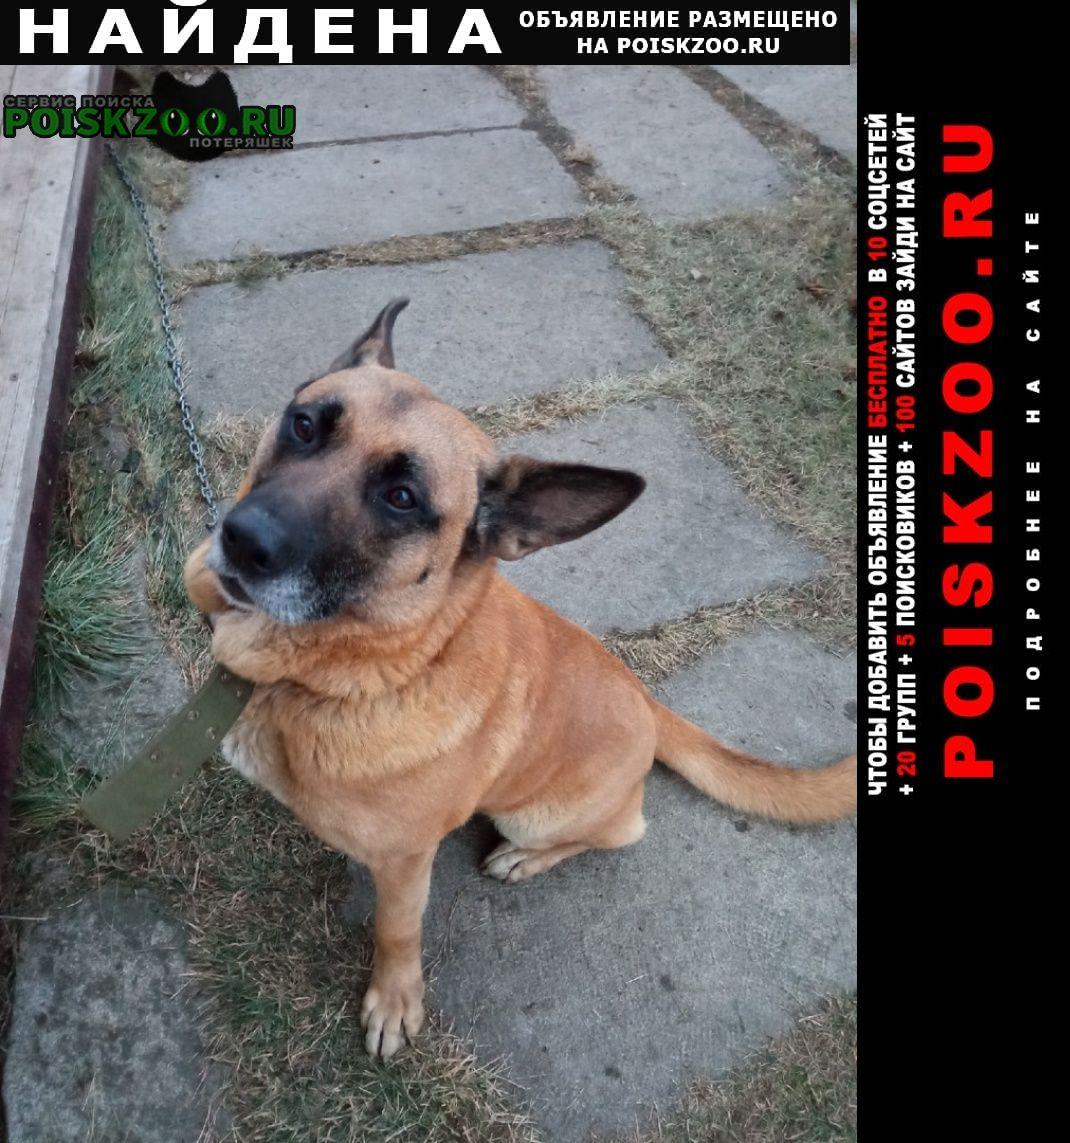 Найдена собака кобель метис бельгийской овчарки Екатеринбург